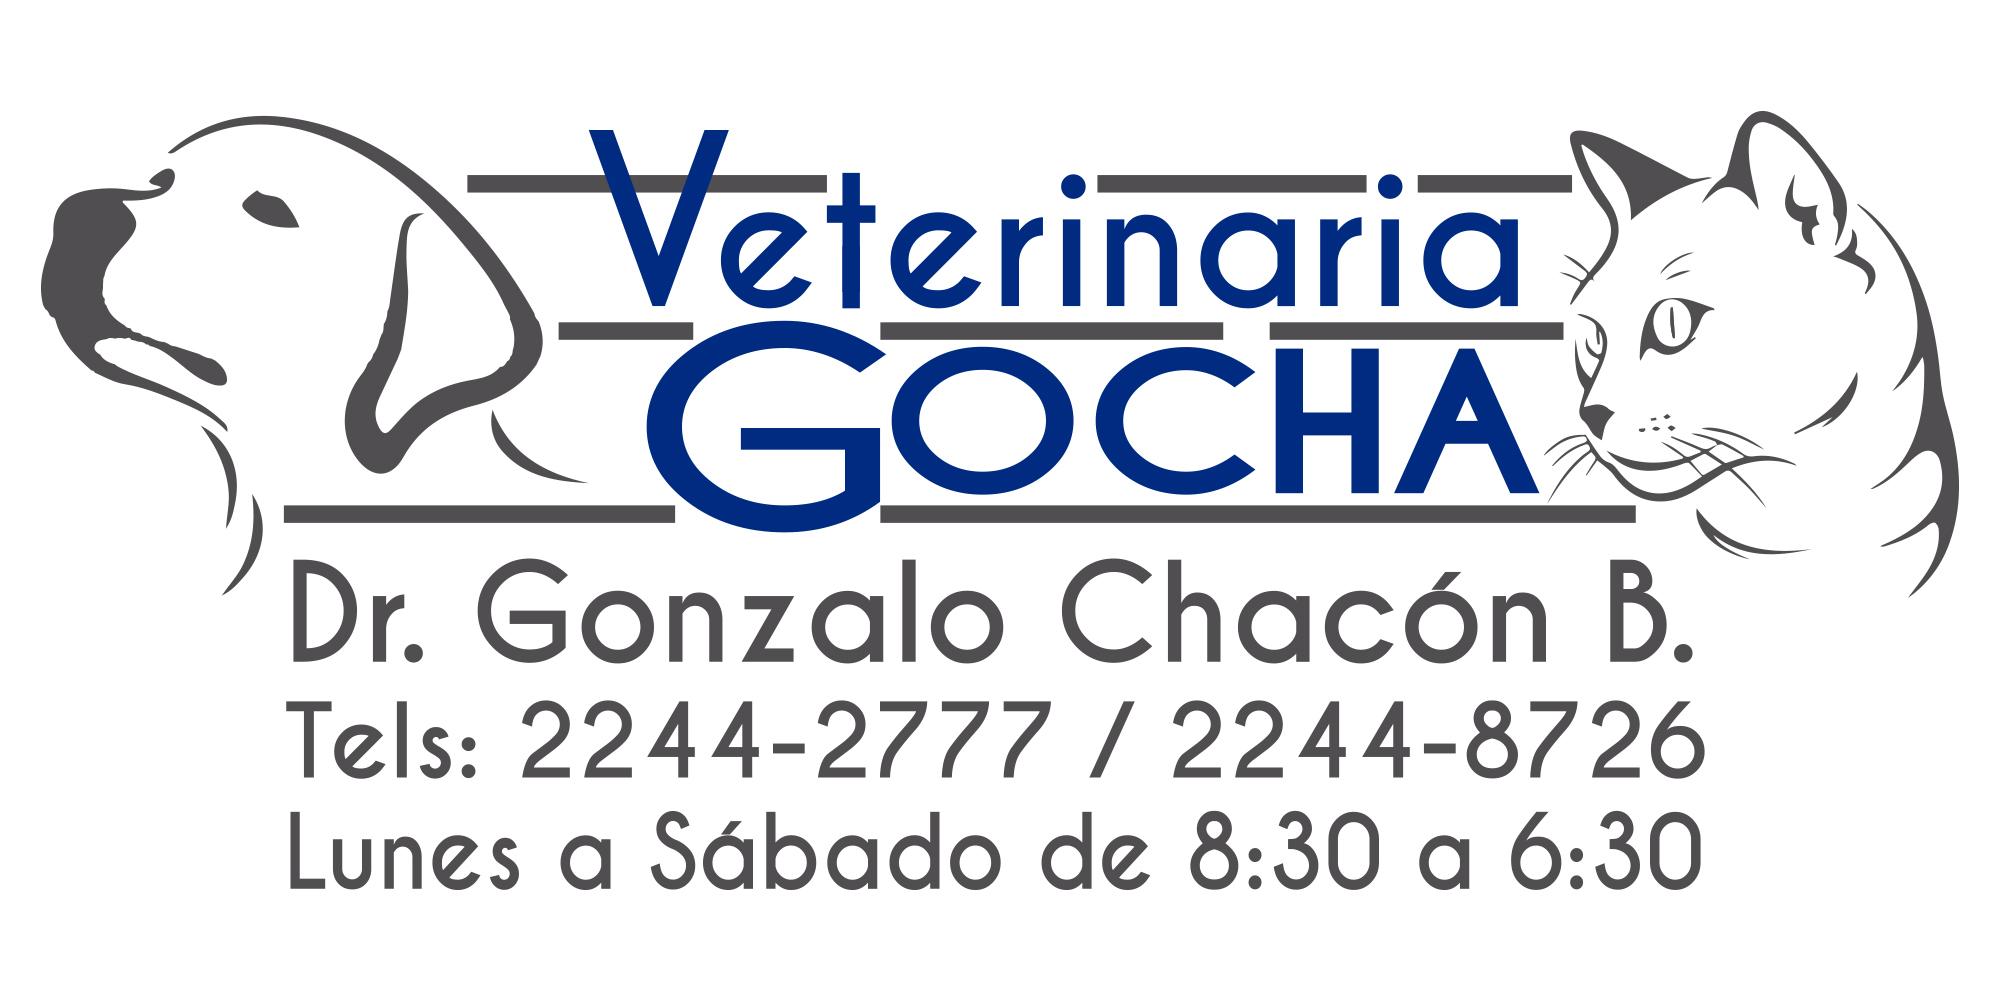 VeterinariaGOCHA